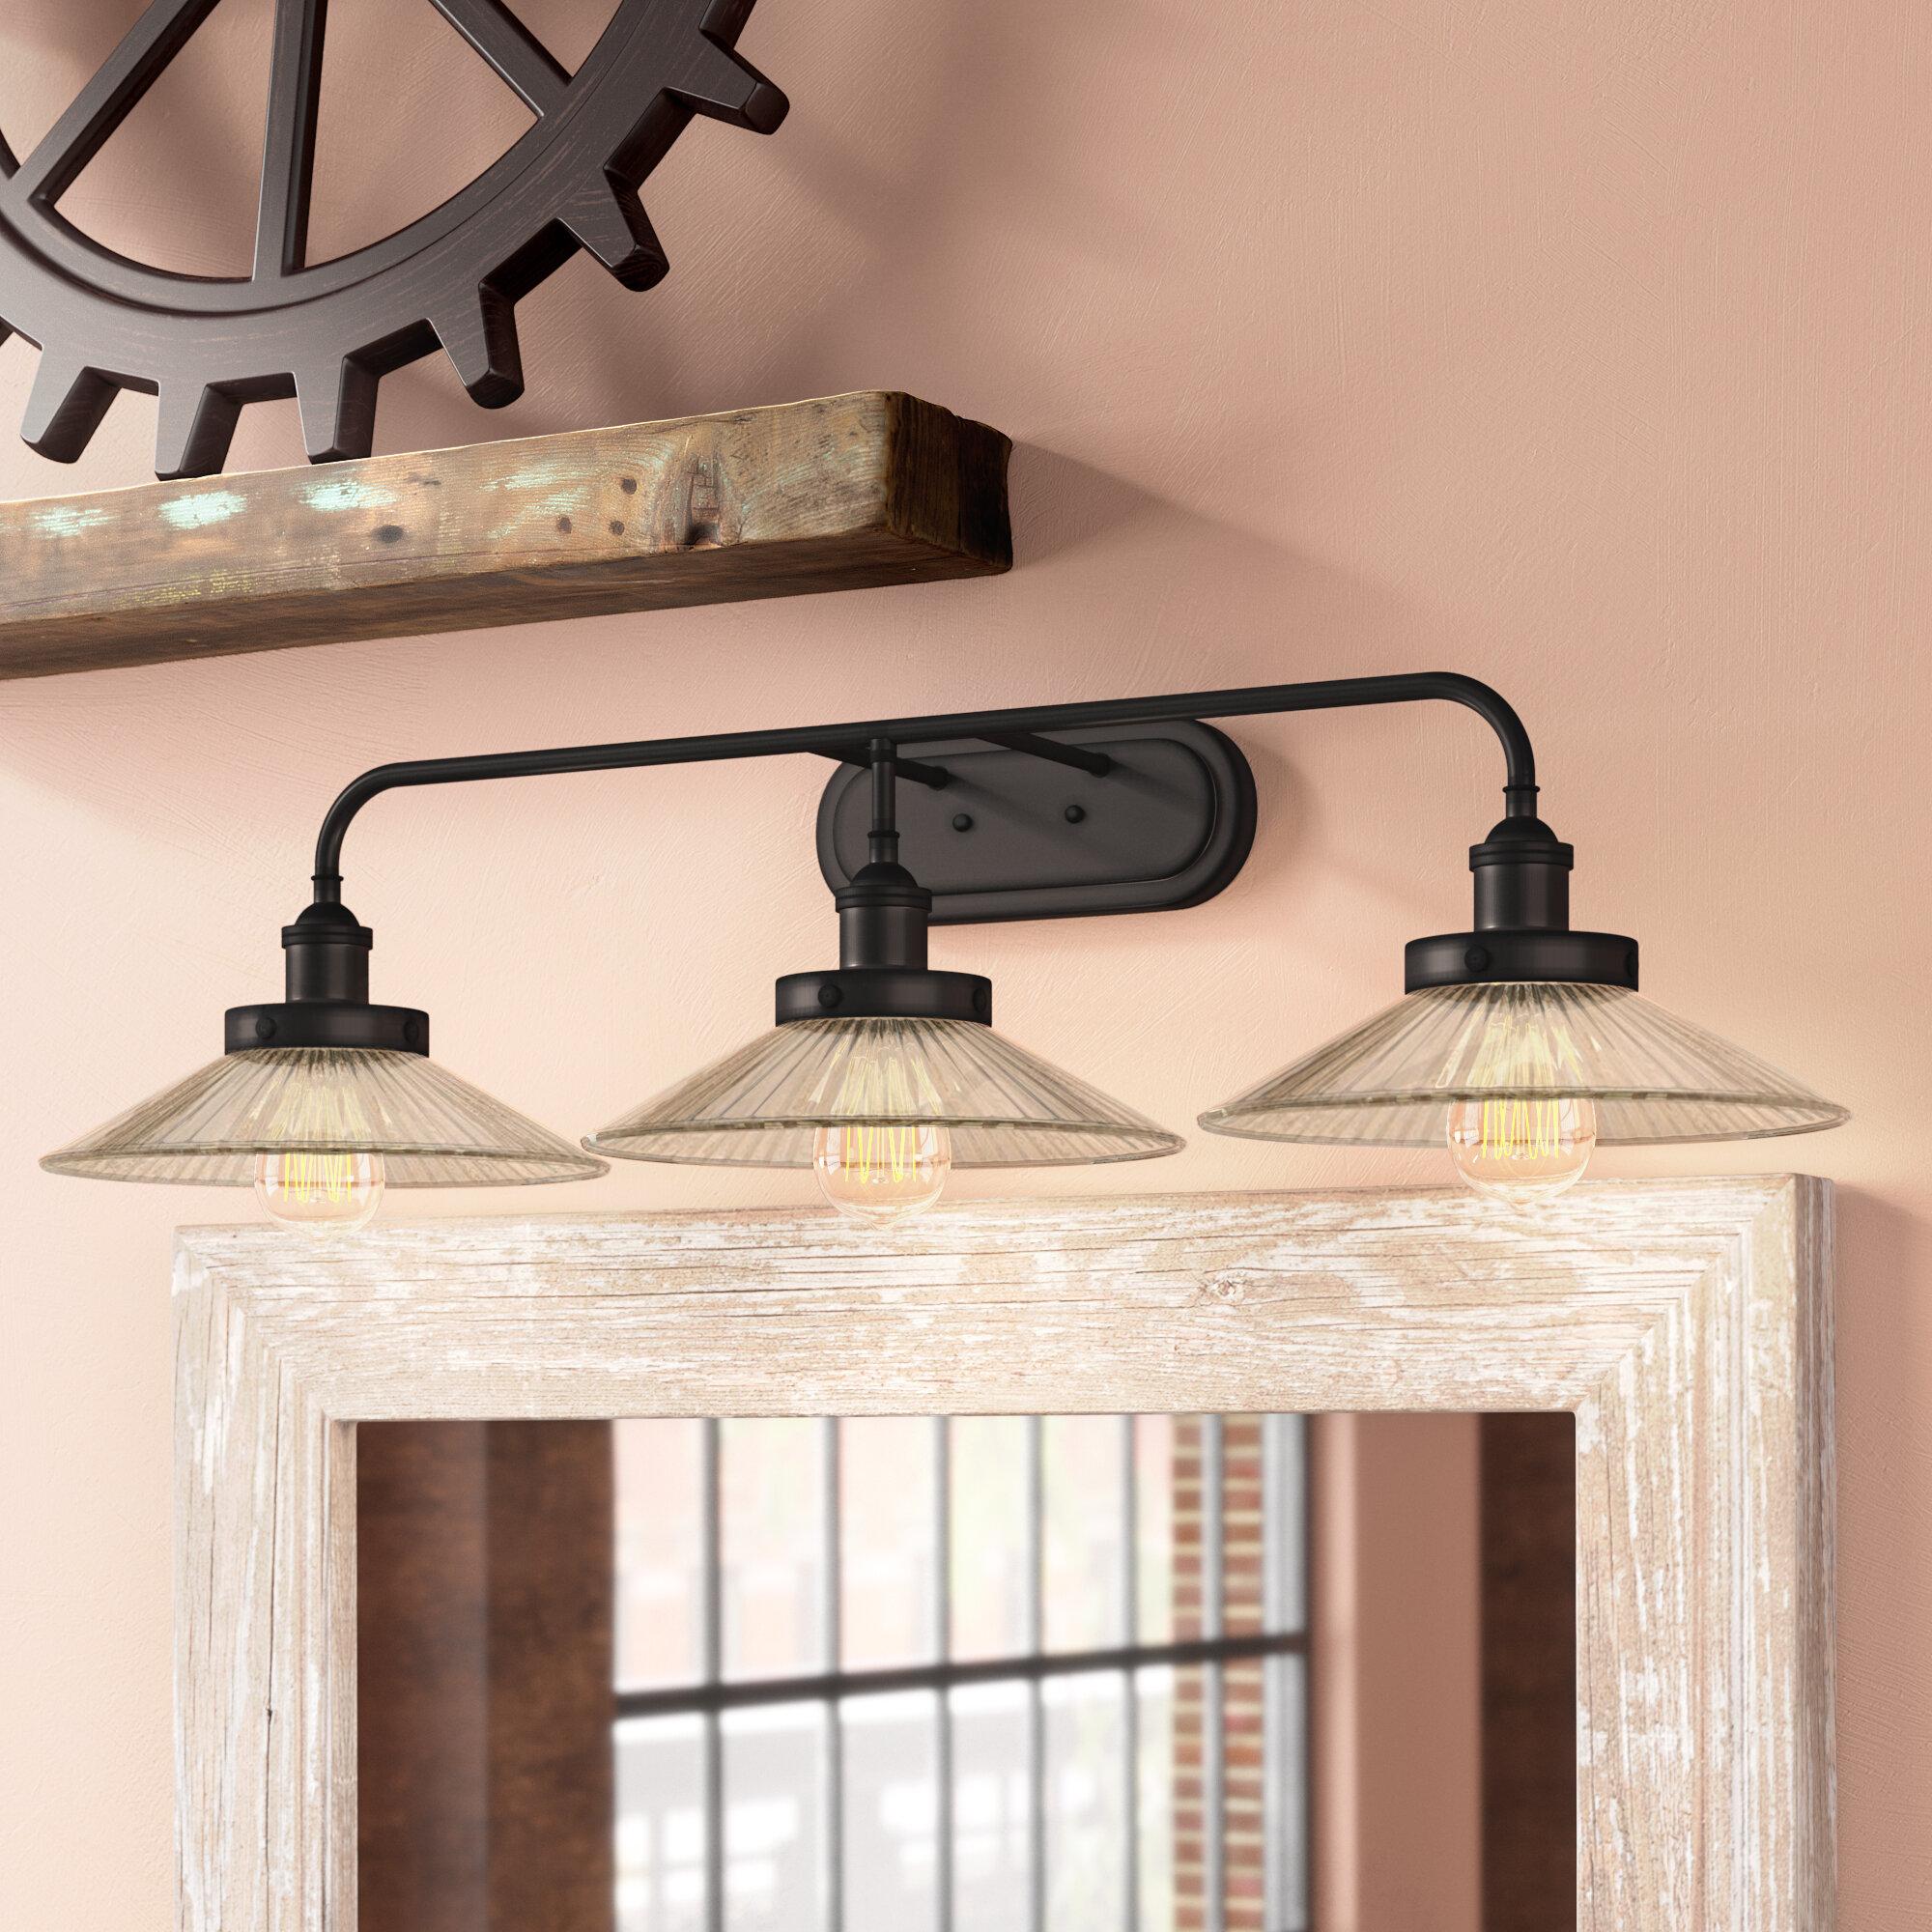 Williston Forge Lisbeth 3 Light Dimmable Oil Rubbed Bronze Vanity Light Reviews Wayfair